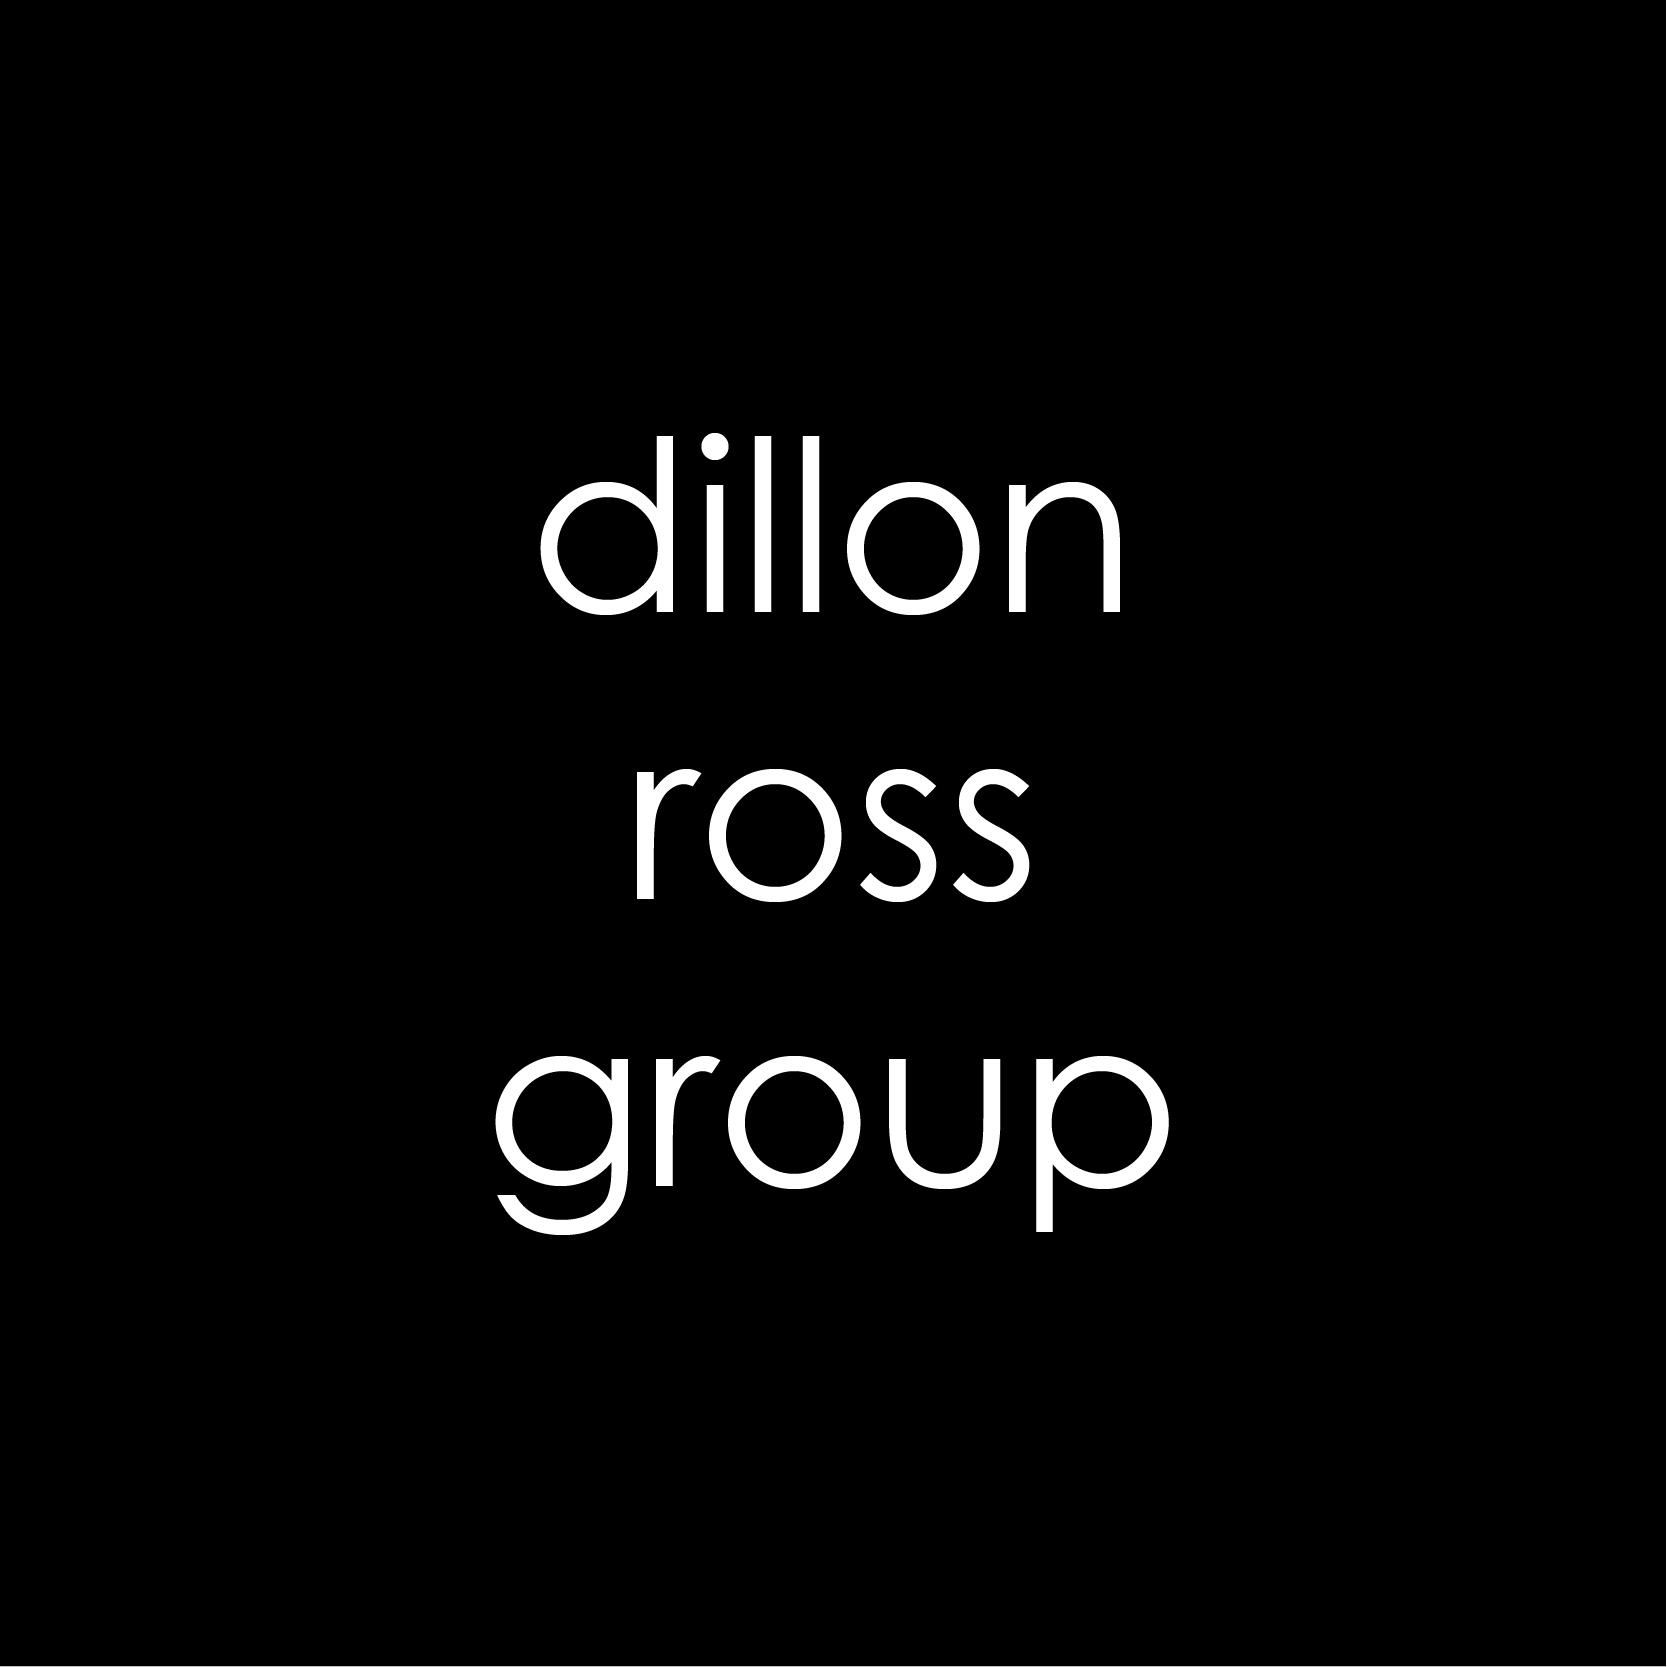 The Dillon Ross Group Logo